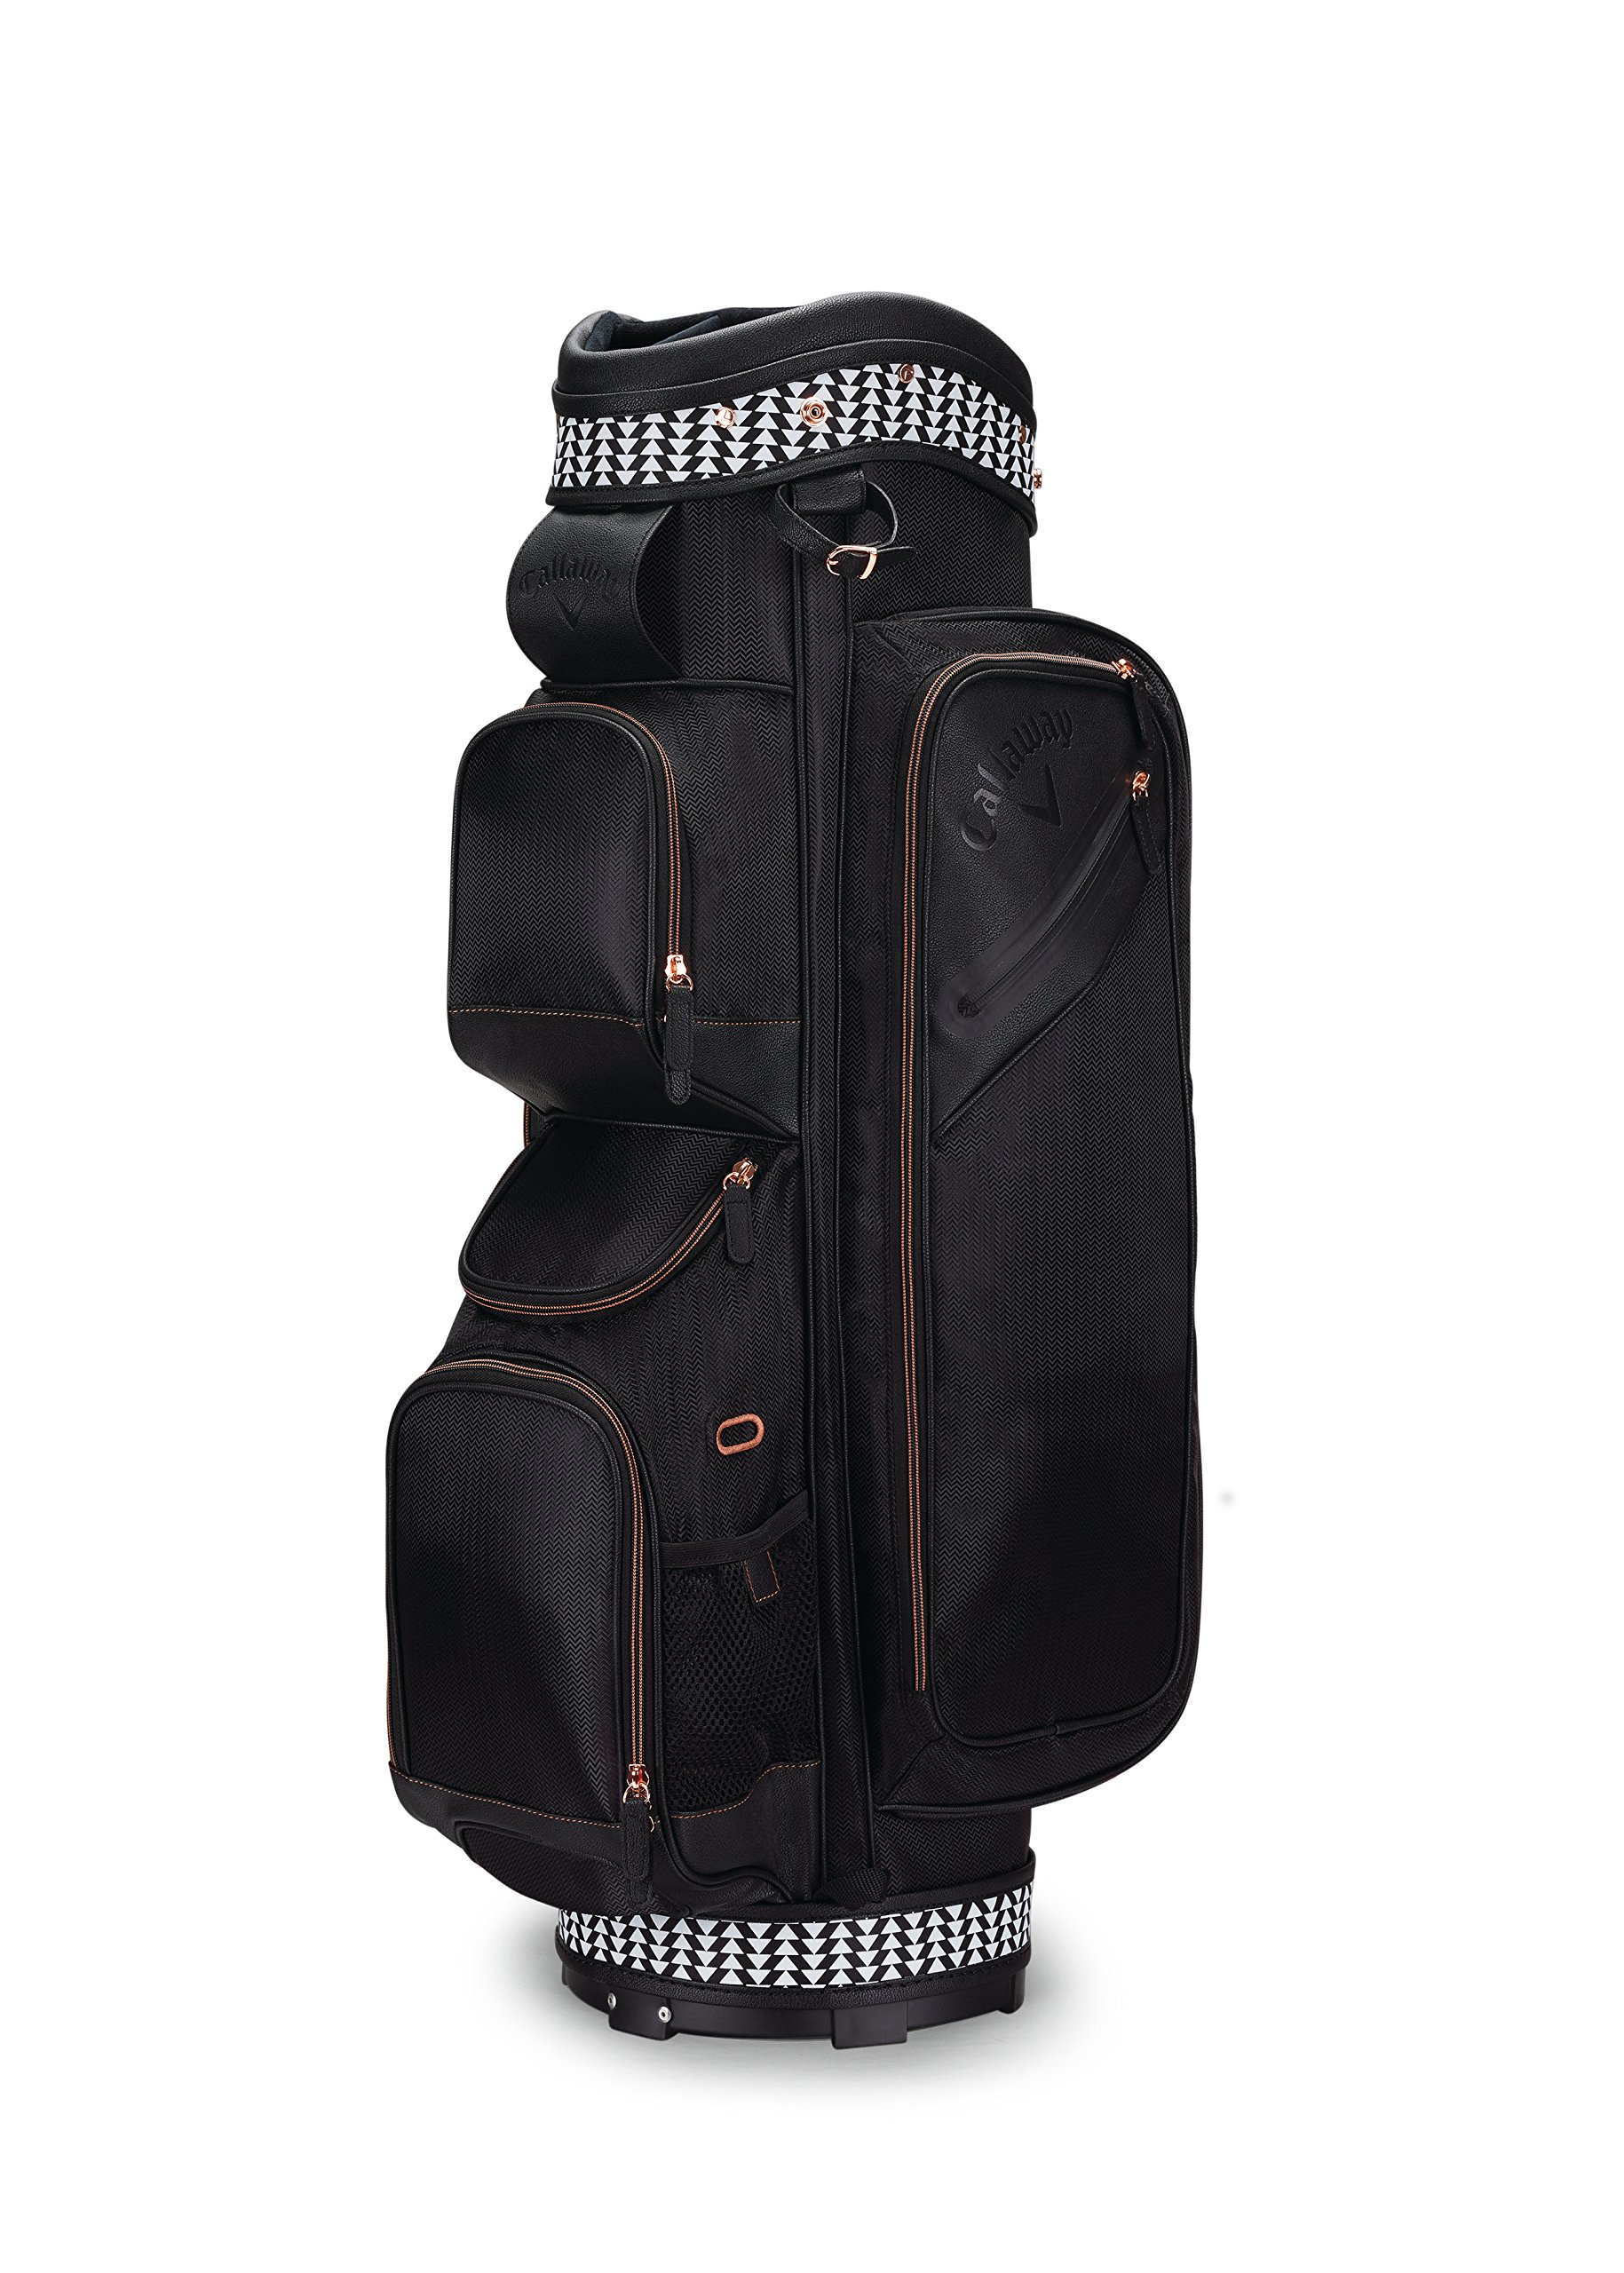 Callaway Golf Uptown Cart Bag Golf Bag Cart 2017 Uptown black/Rose Gold, Black by Callaway (Image #1)